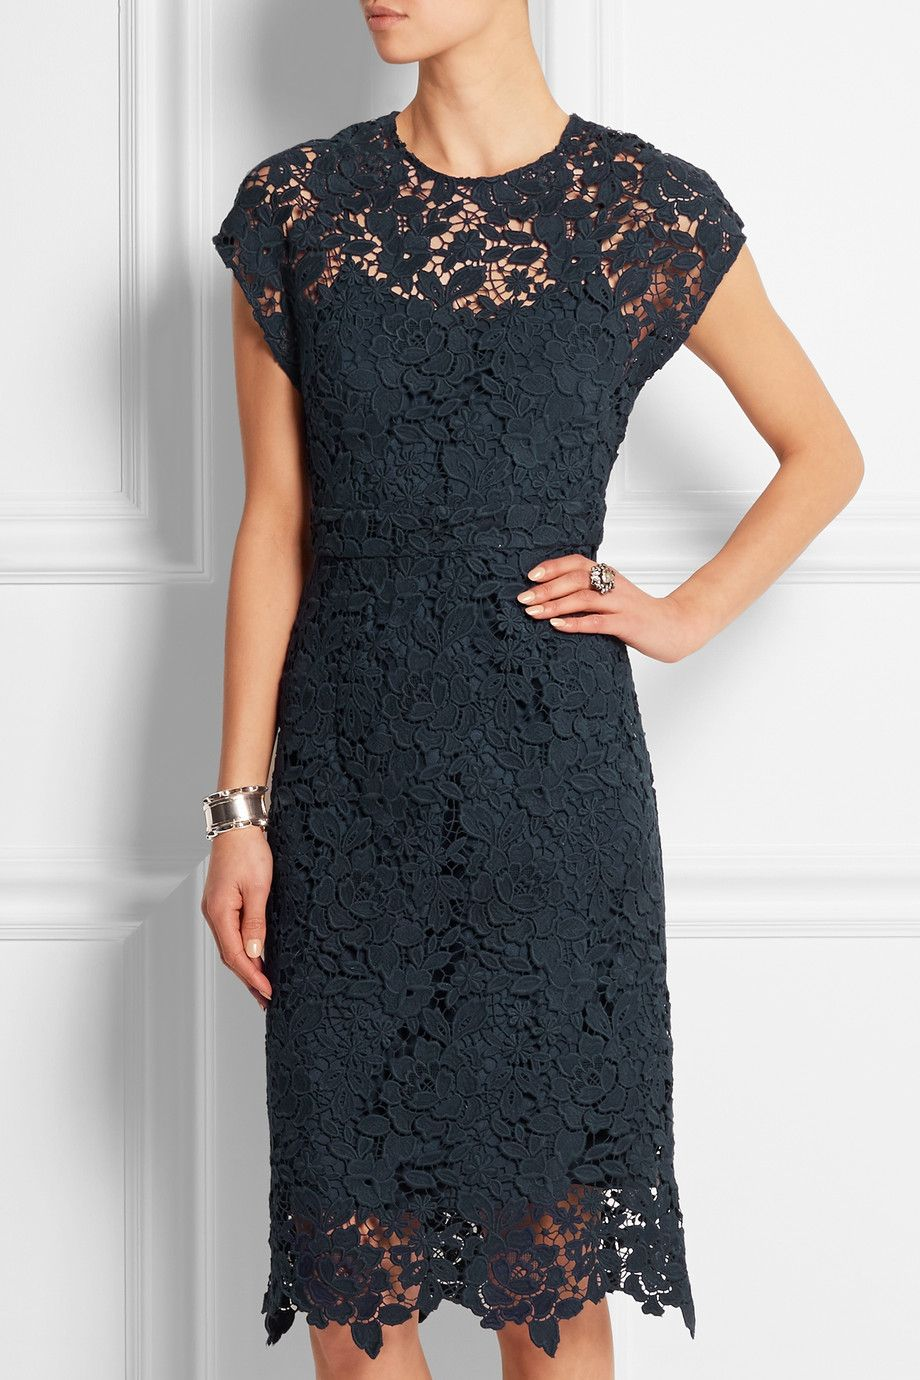 e5b812e0a77 J.Crew - Collection scalloped guipure lace dress